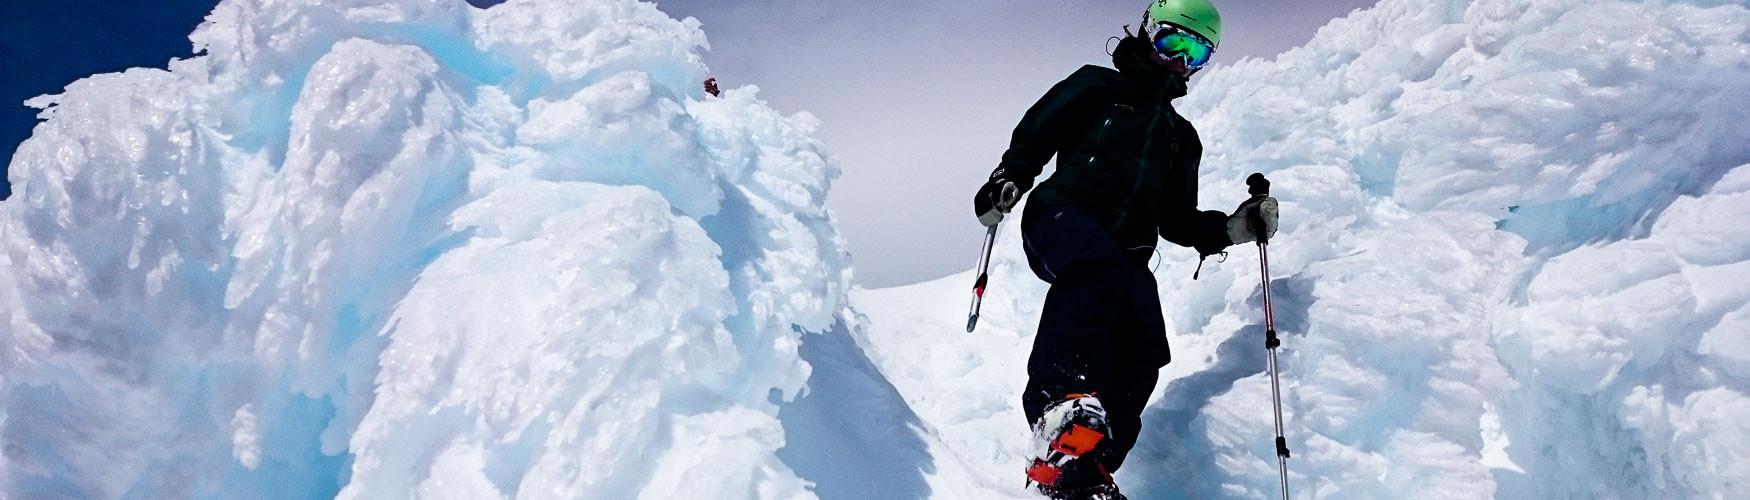 Chile Vulkane Skitour